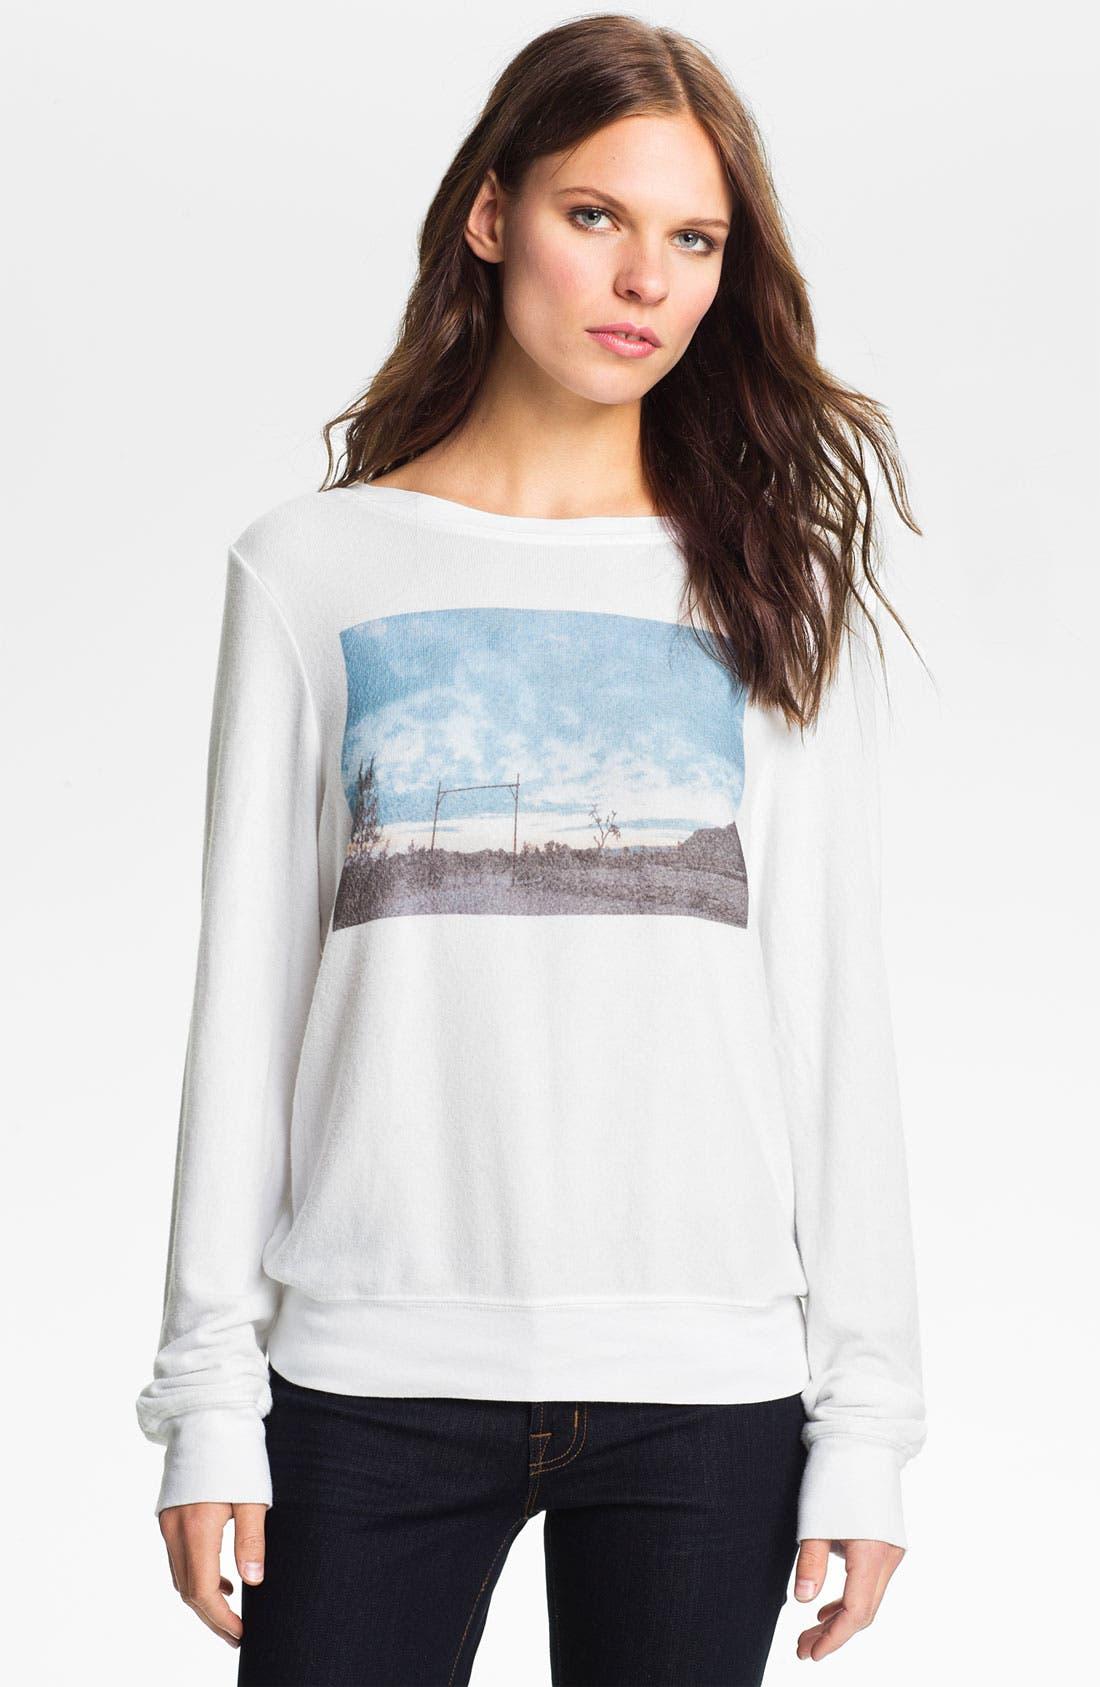 Alternate Image 1 Selected - Wildfox 'Camp Nowhere' Graphic Sweatshirt